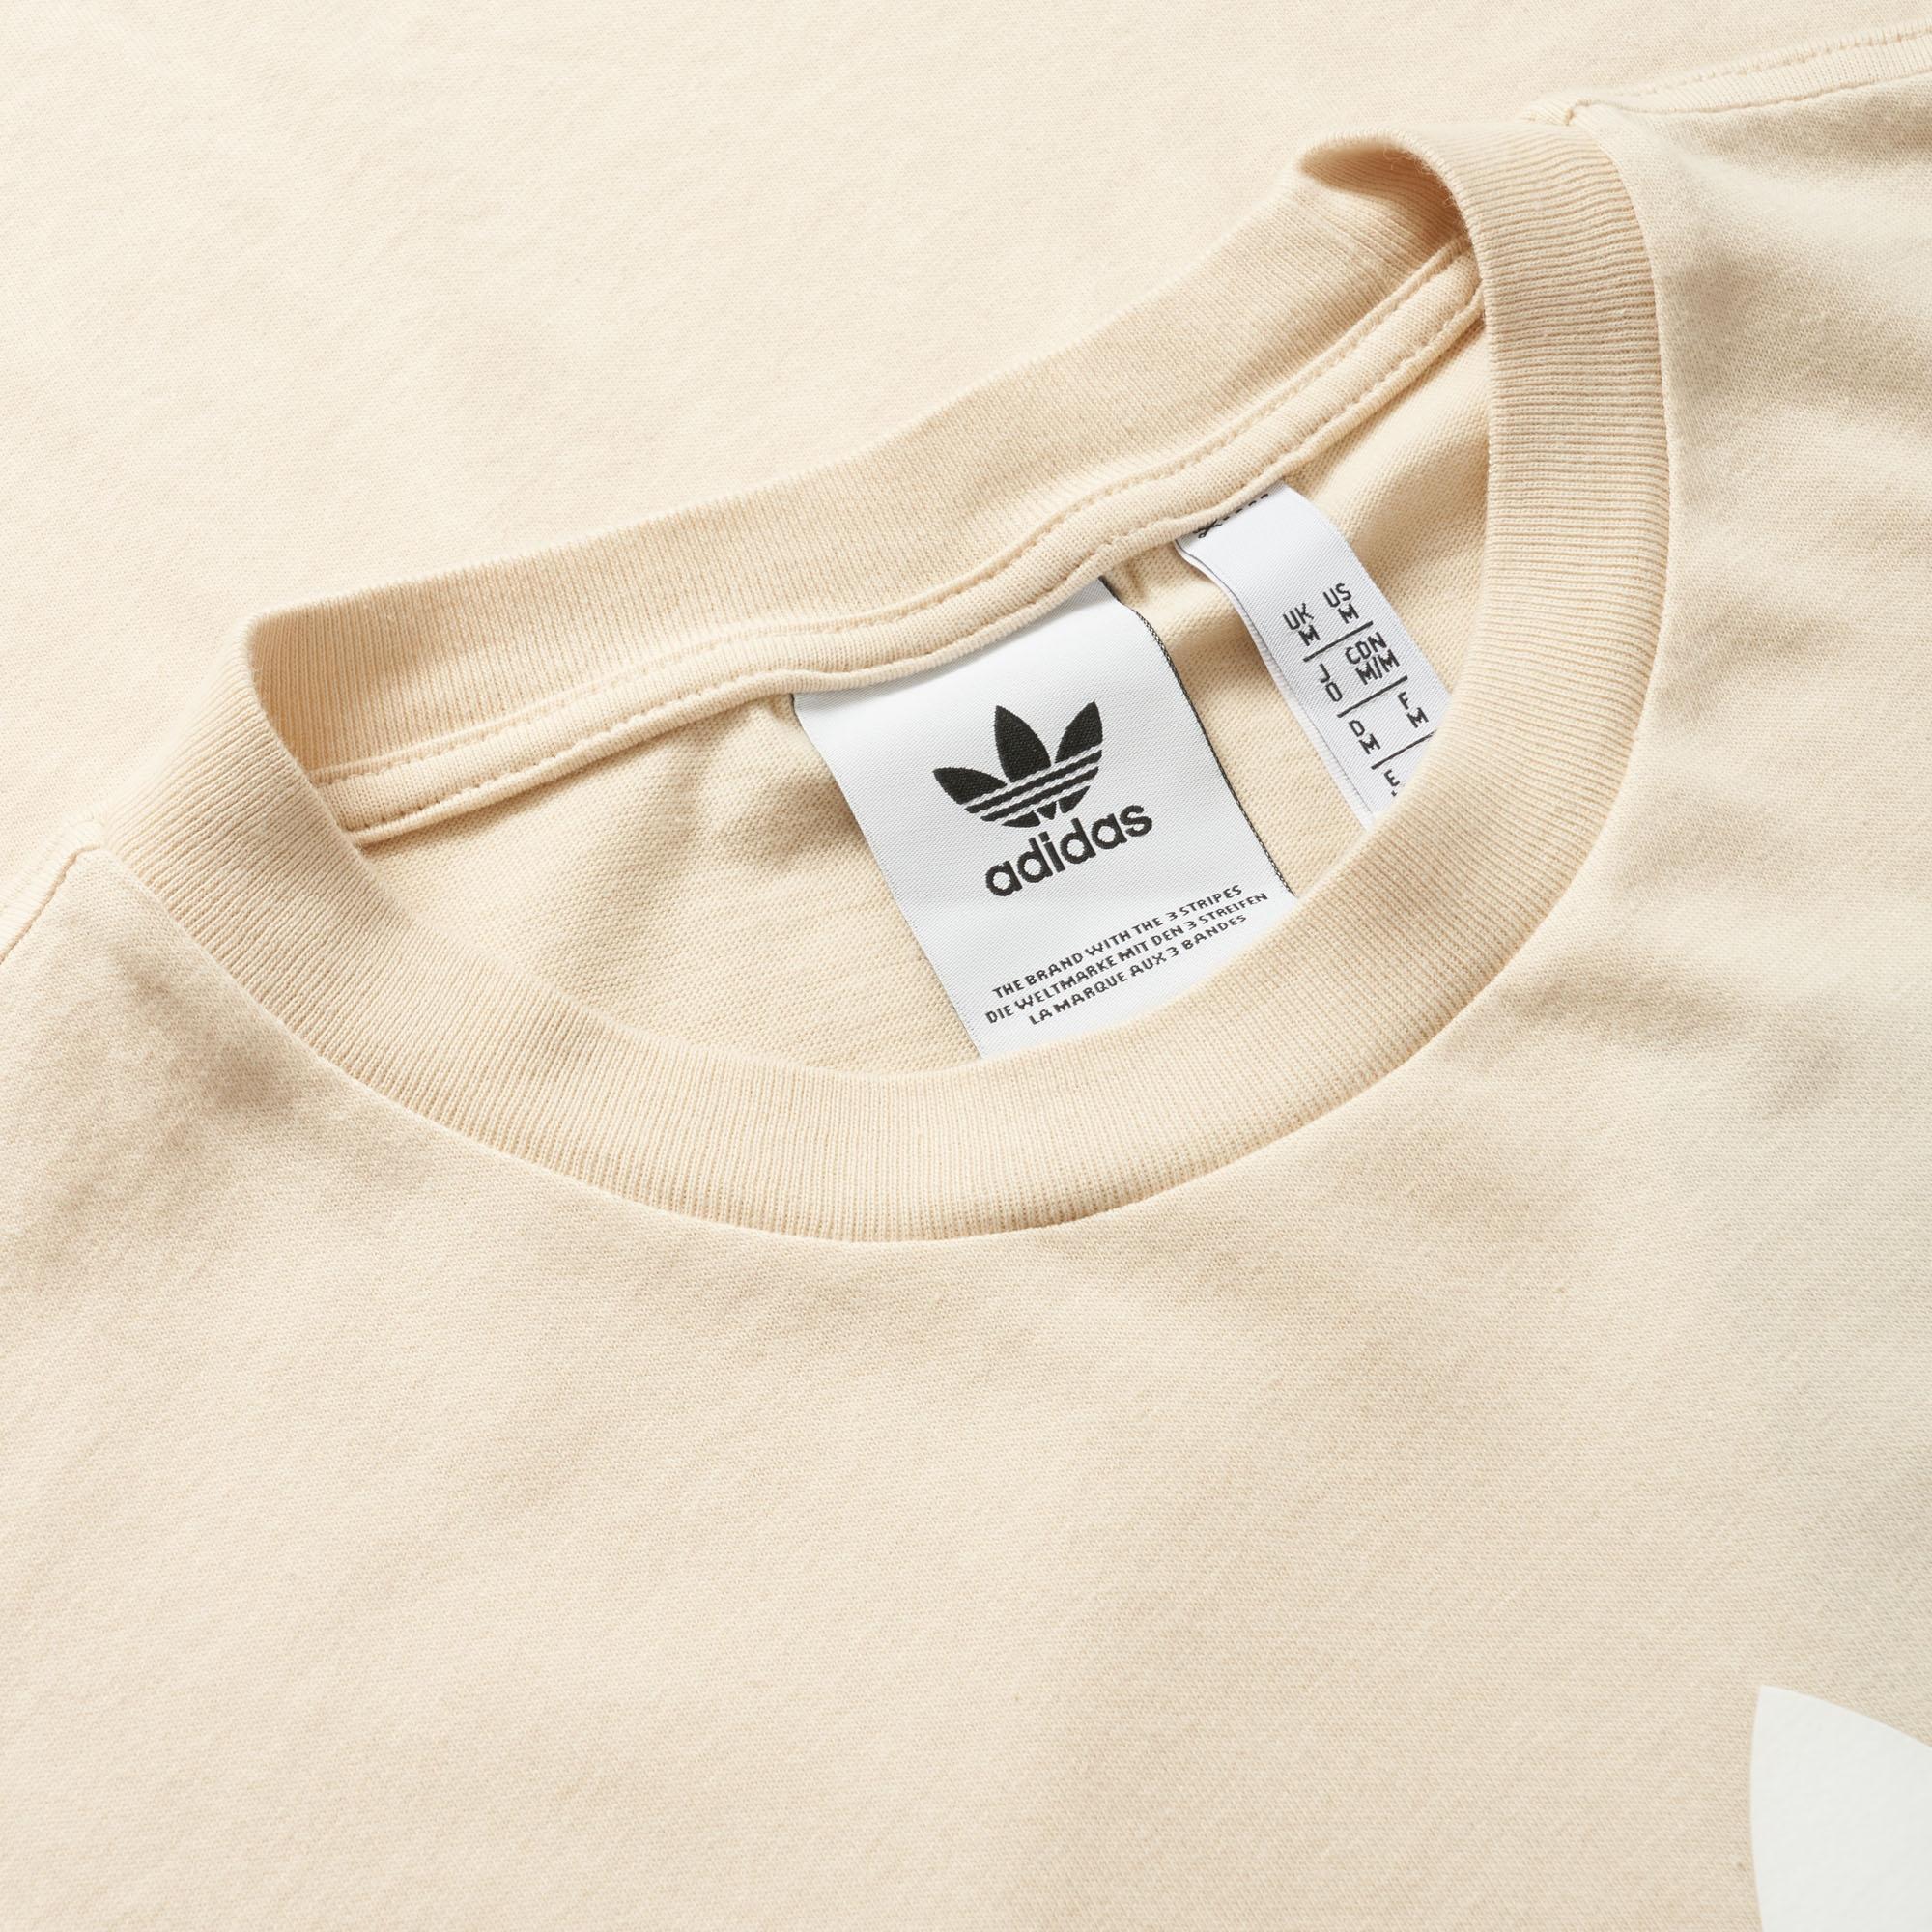 adidas Originals Linen Trefoil Tee in Natural for Men